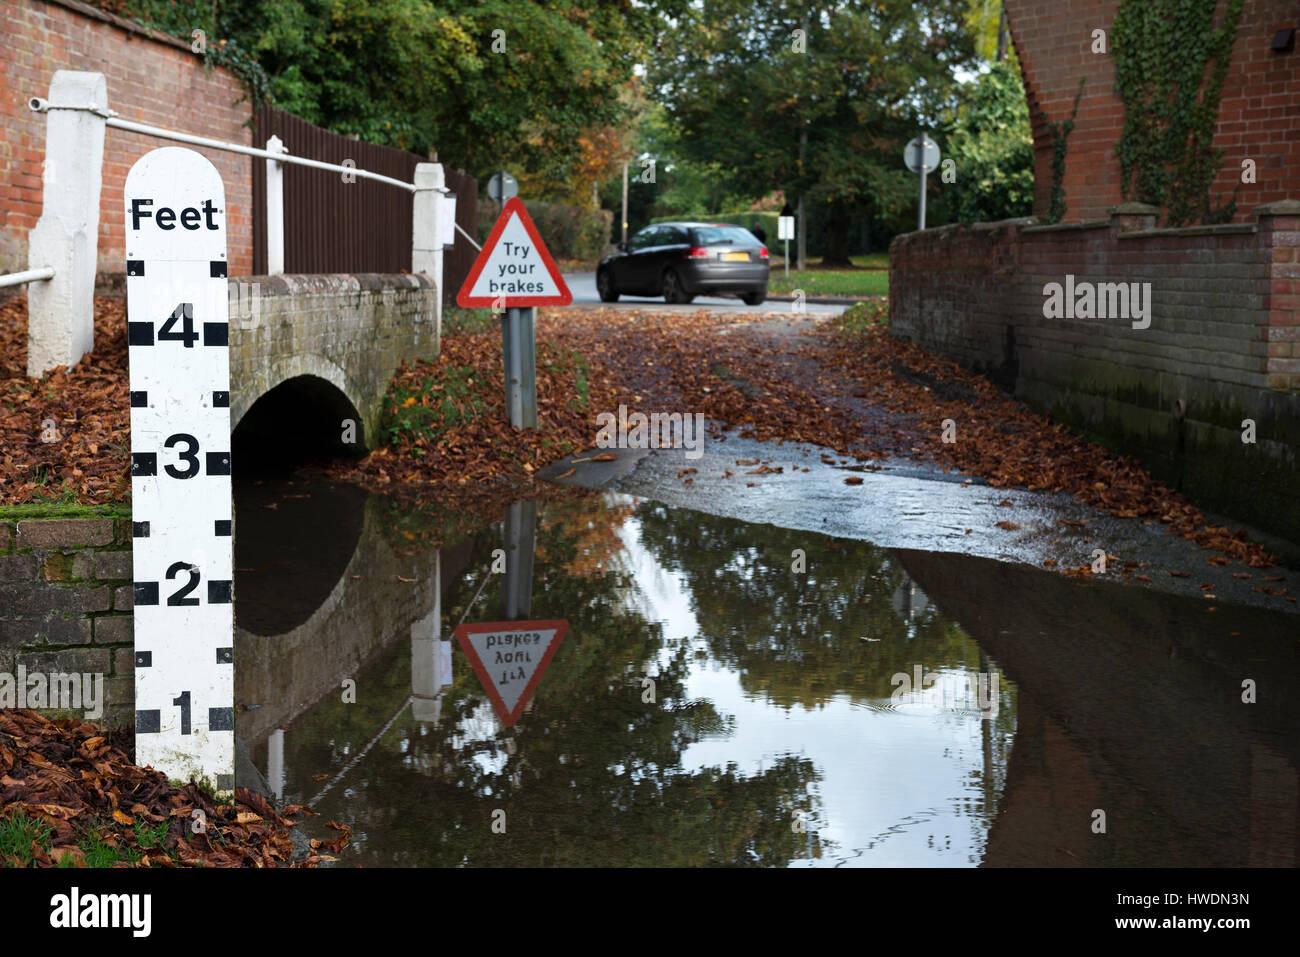 Ford, Grundisburgh, Suffolk, England. - Stock Image